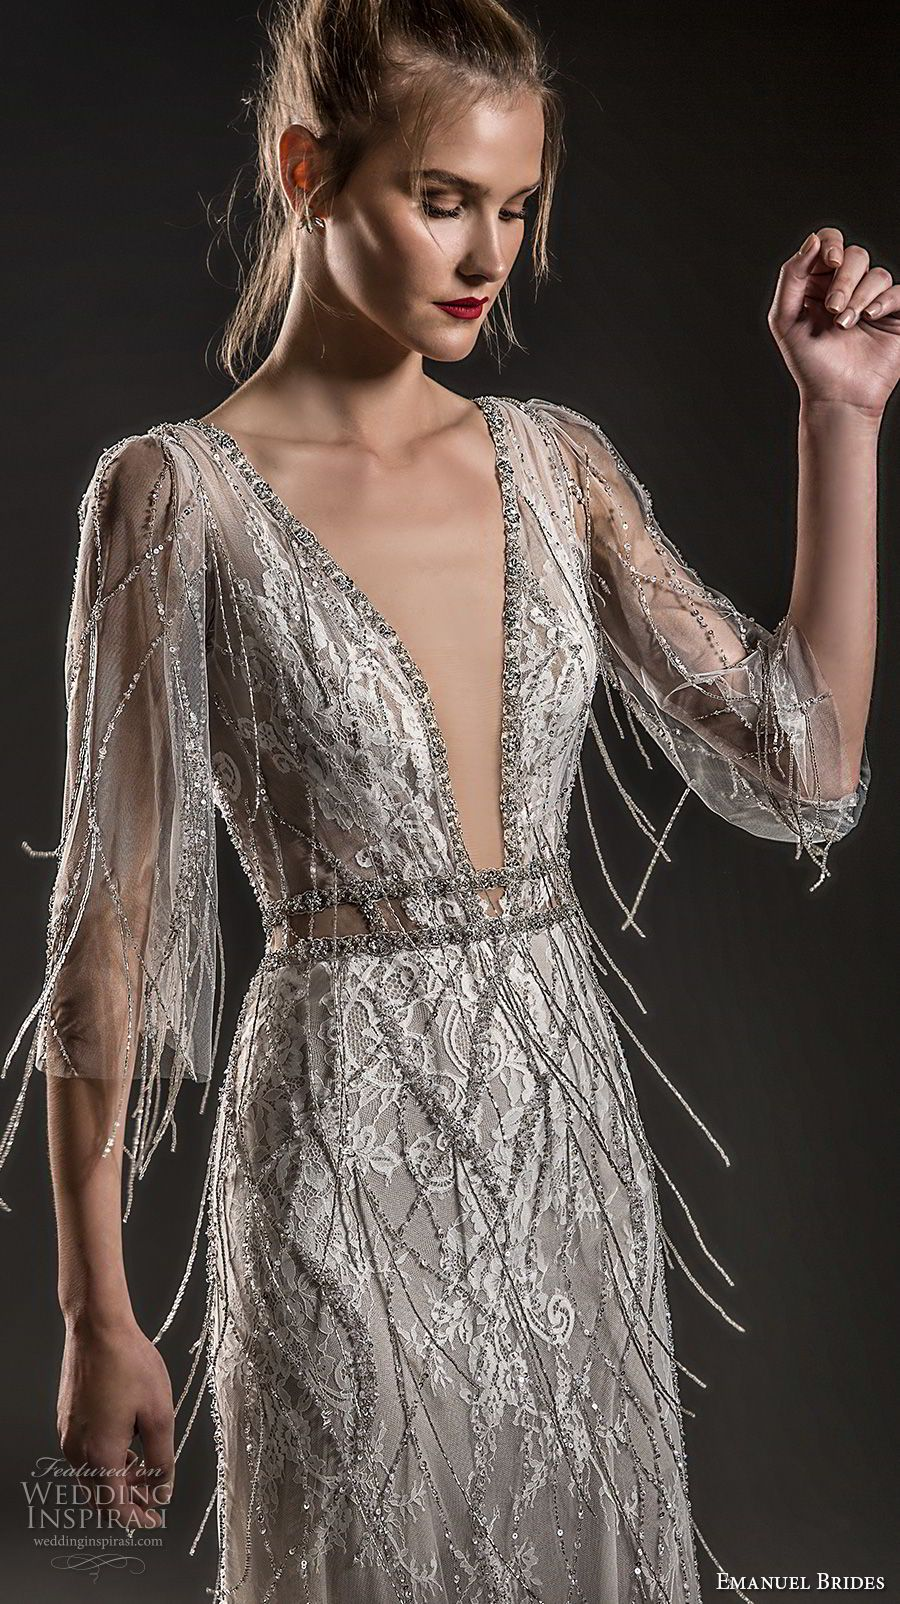 Emanuel brides wedding dresses quarter sleeve bodice and